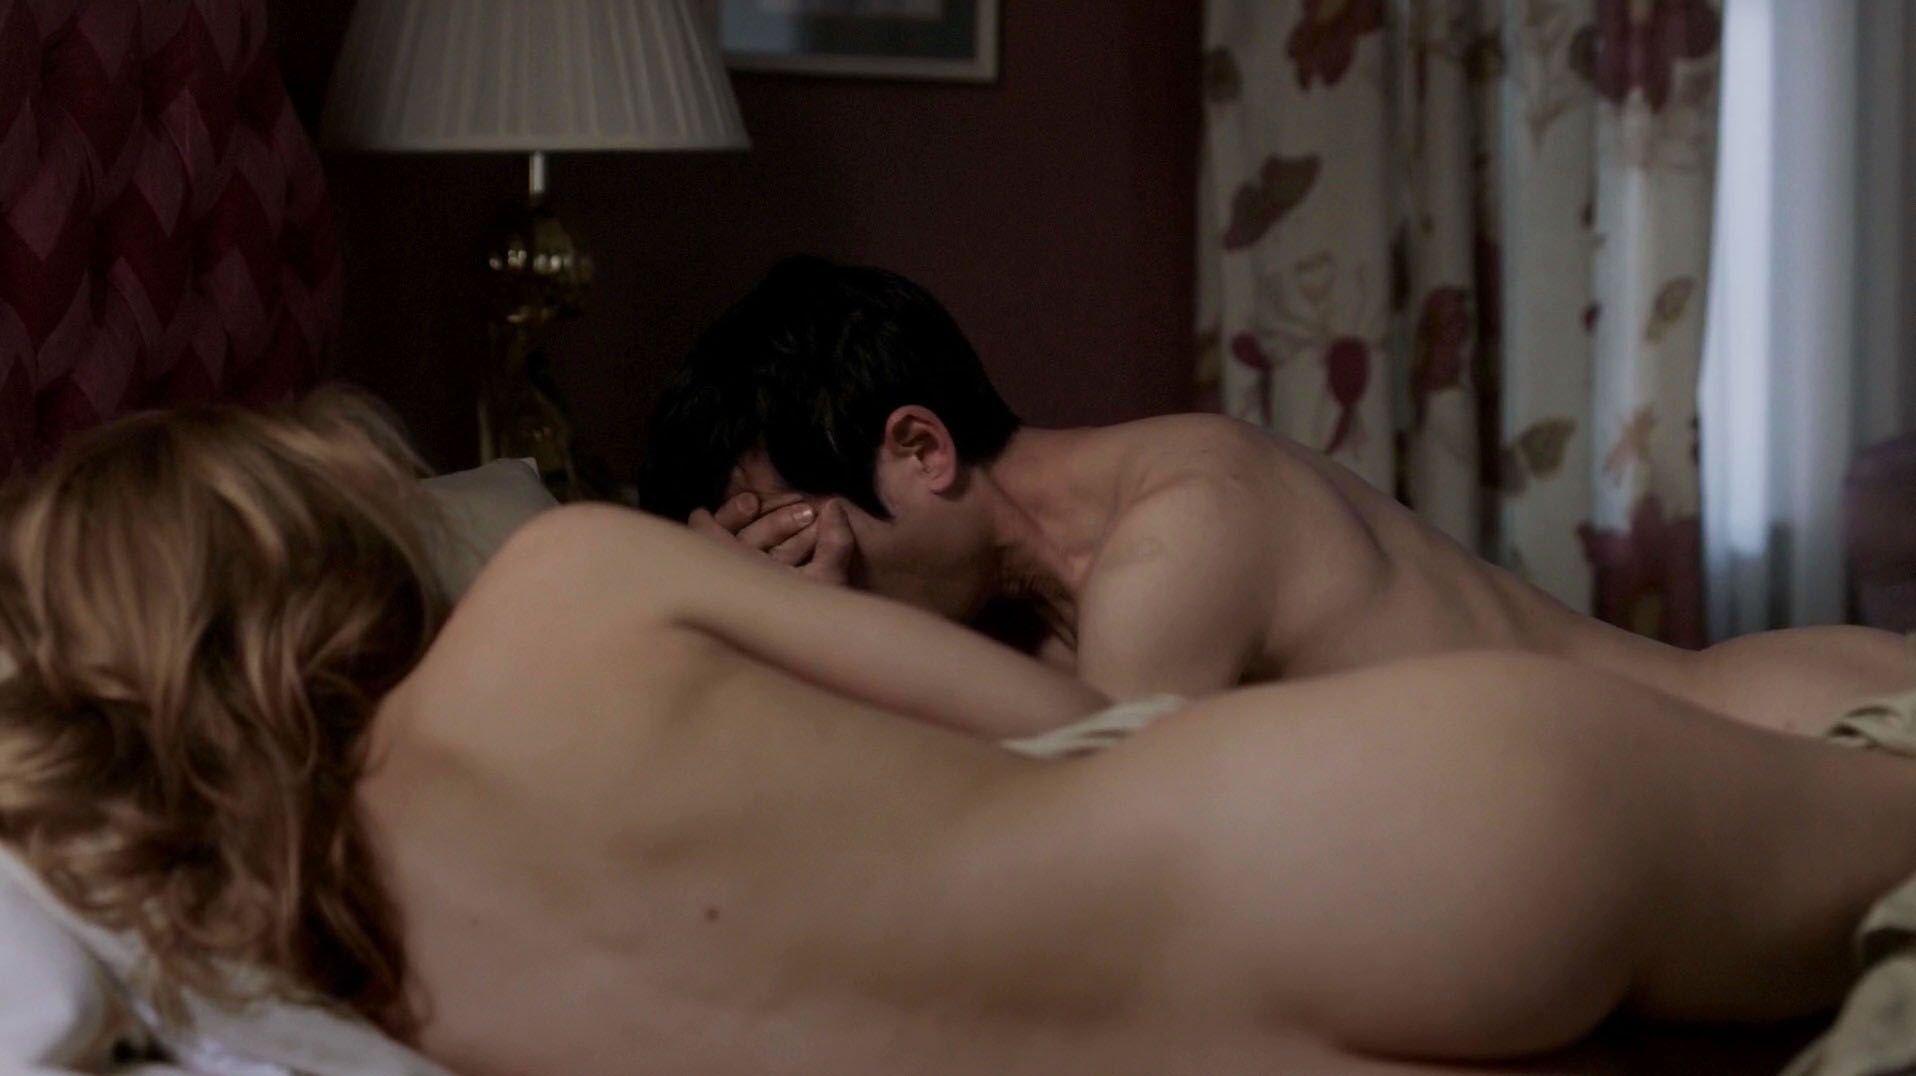 Keri russell naked